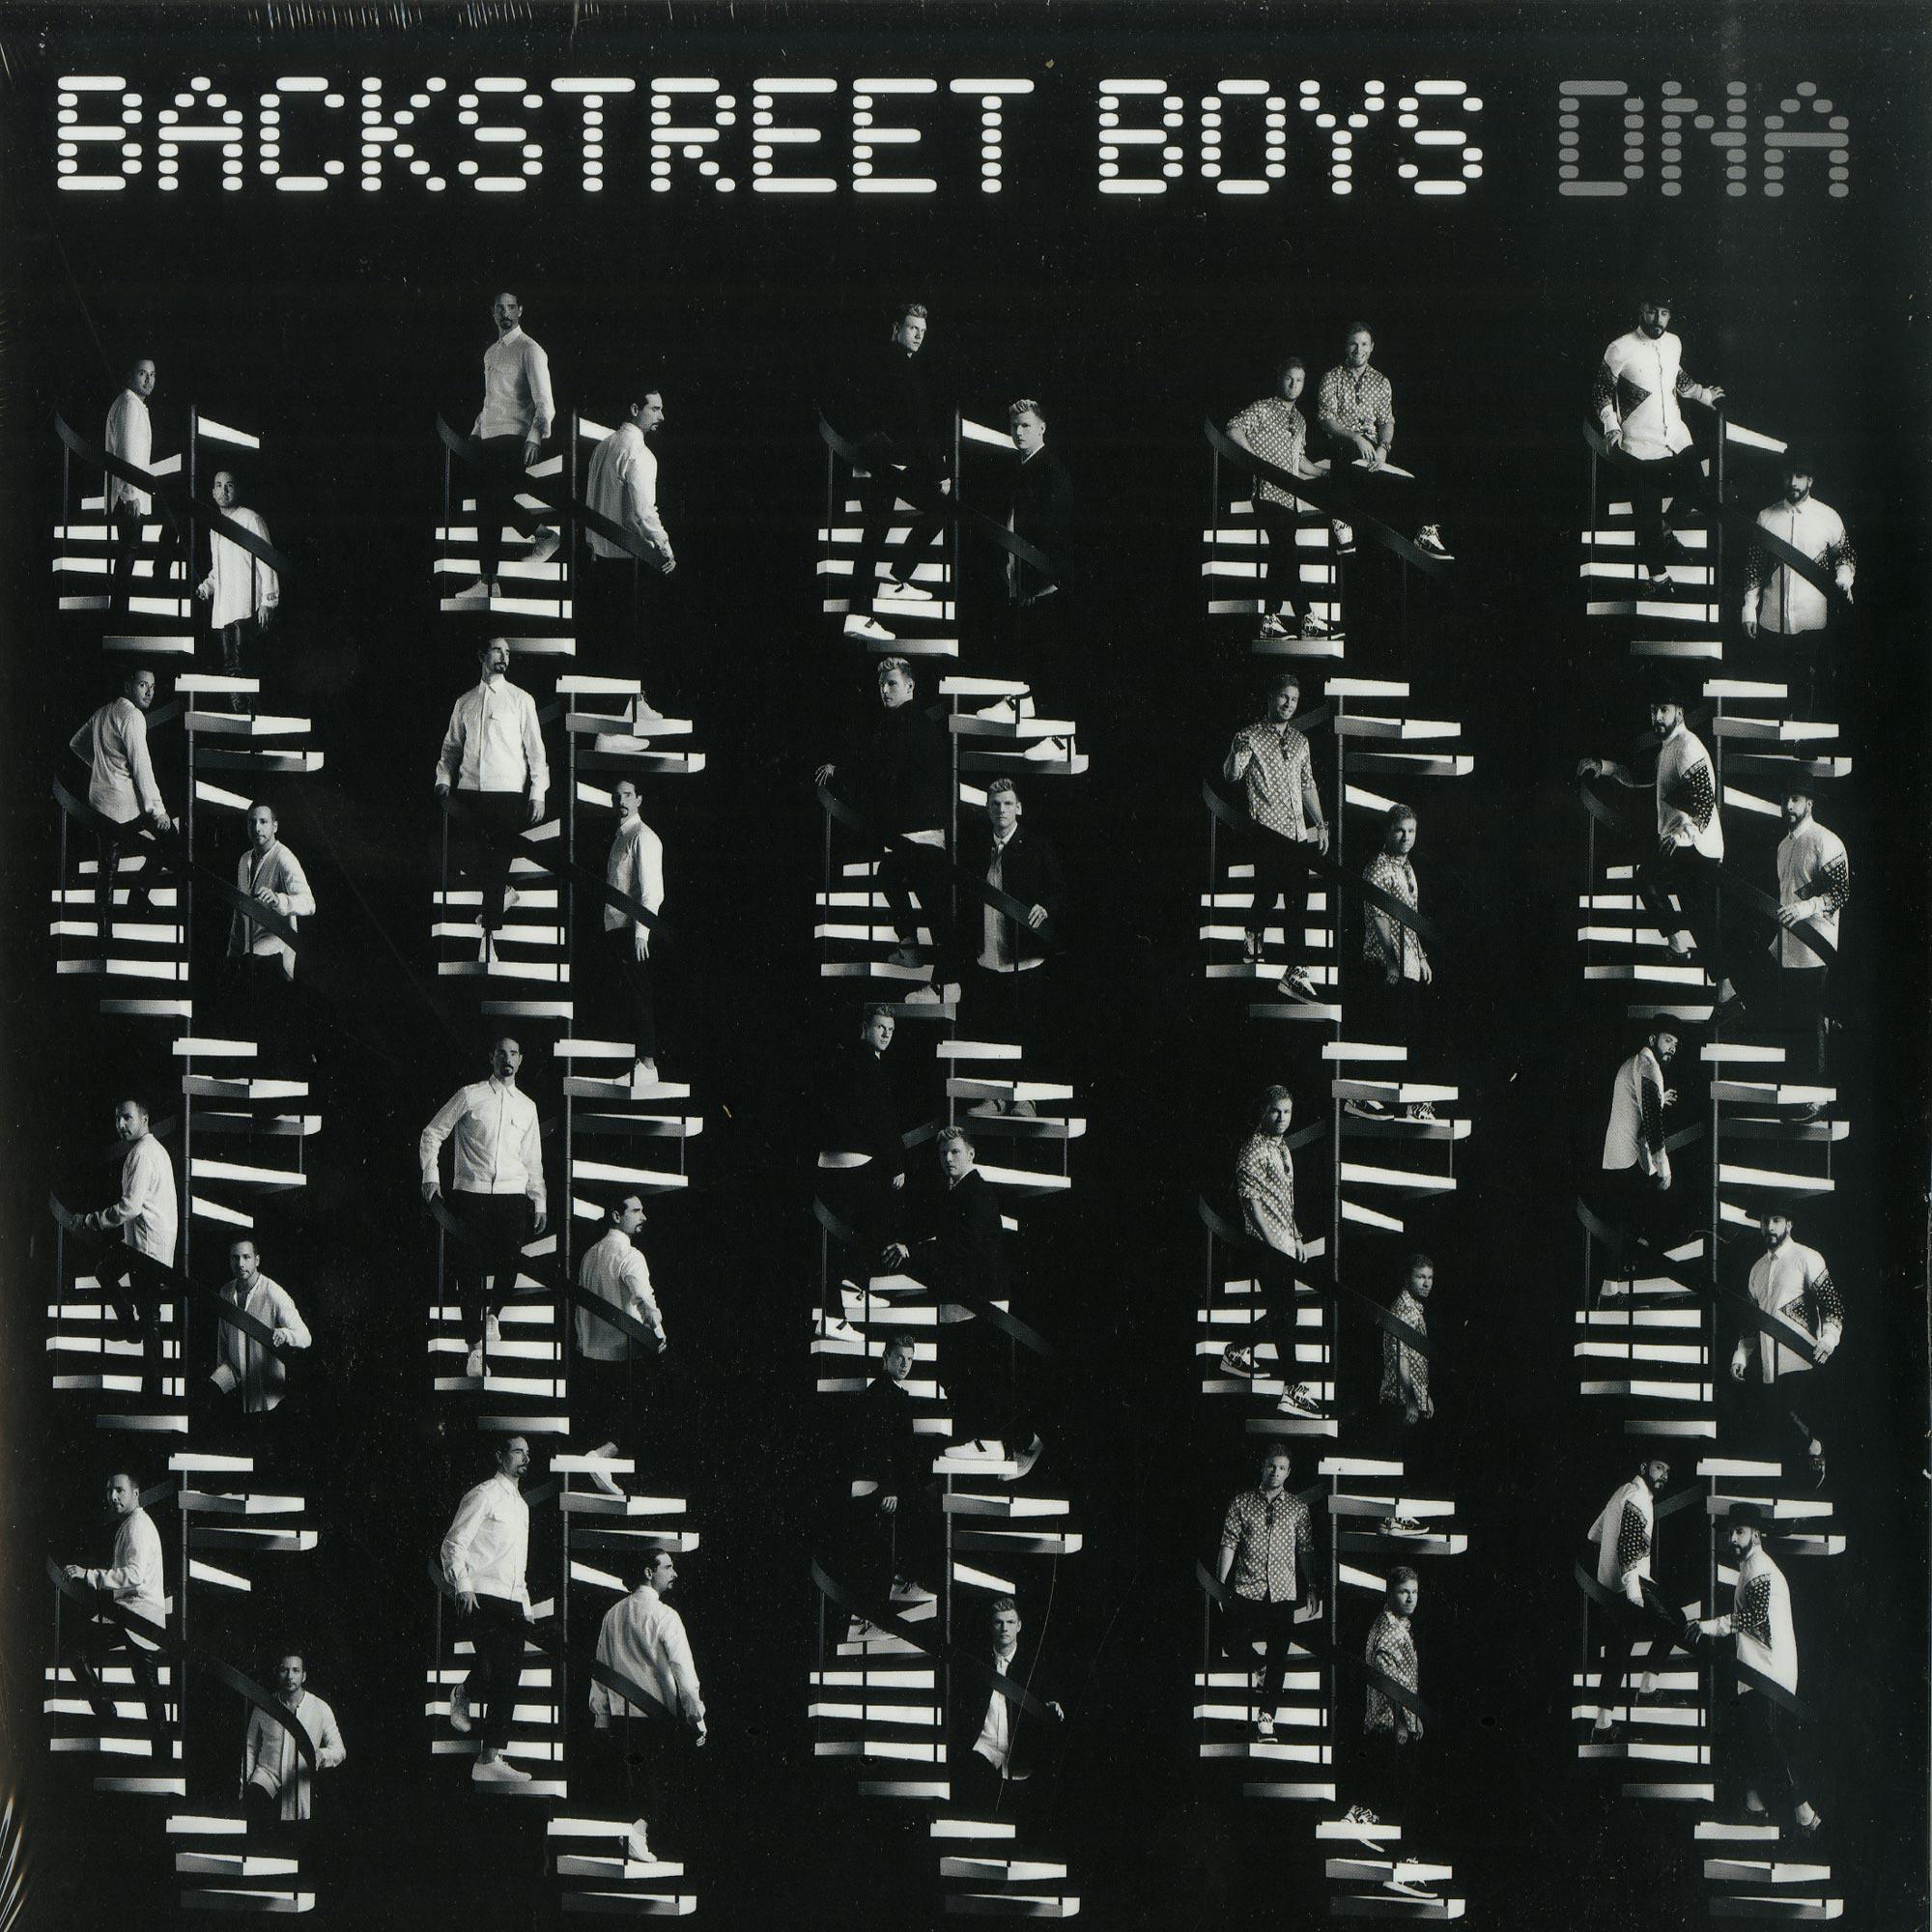 Backstreet Boys - DNA